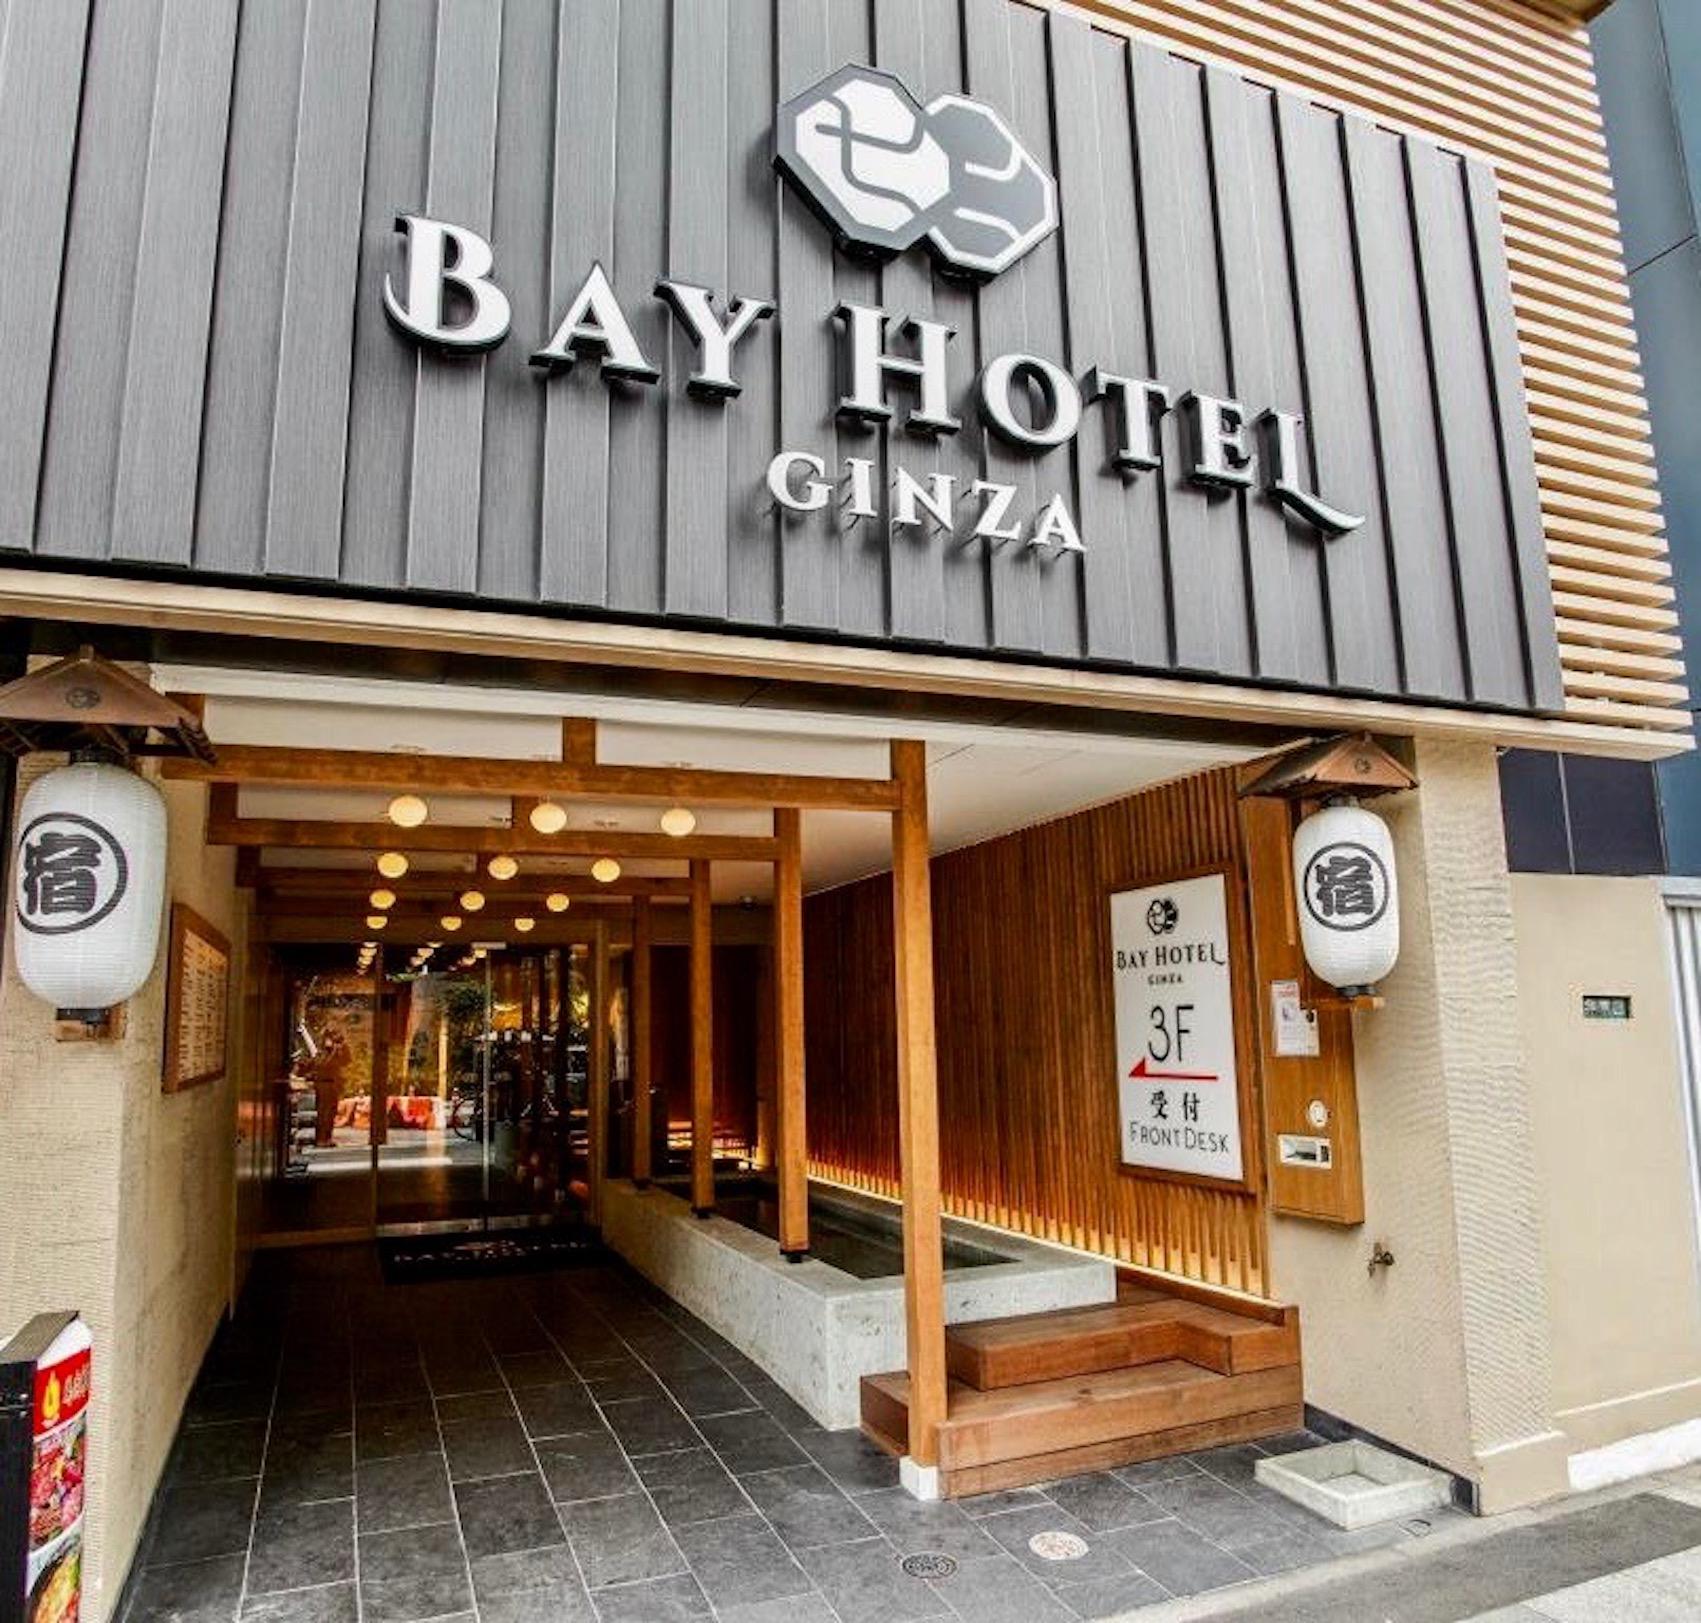 Exterior Ginza Bay Hotel Tokyo.